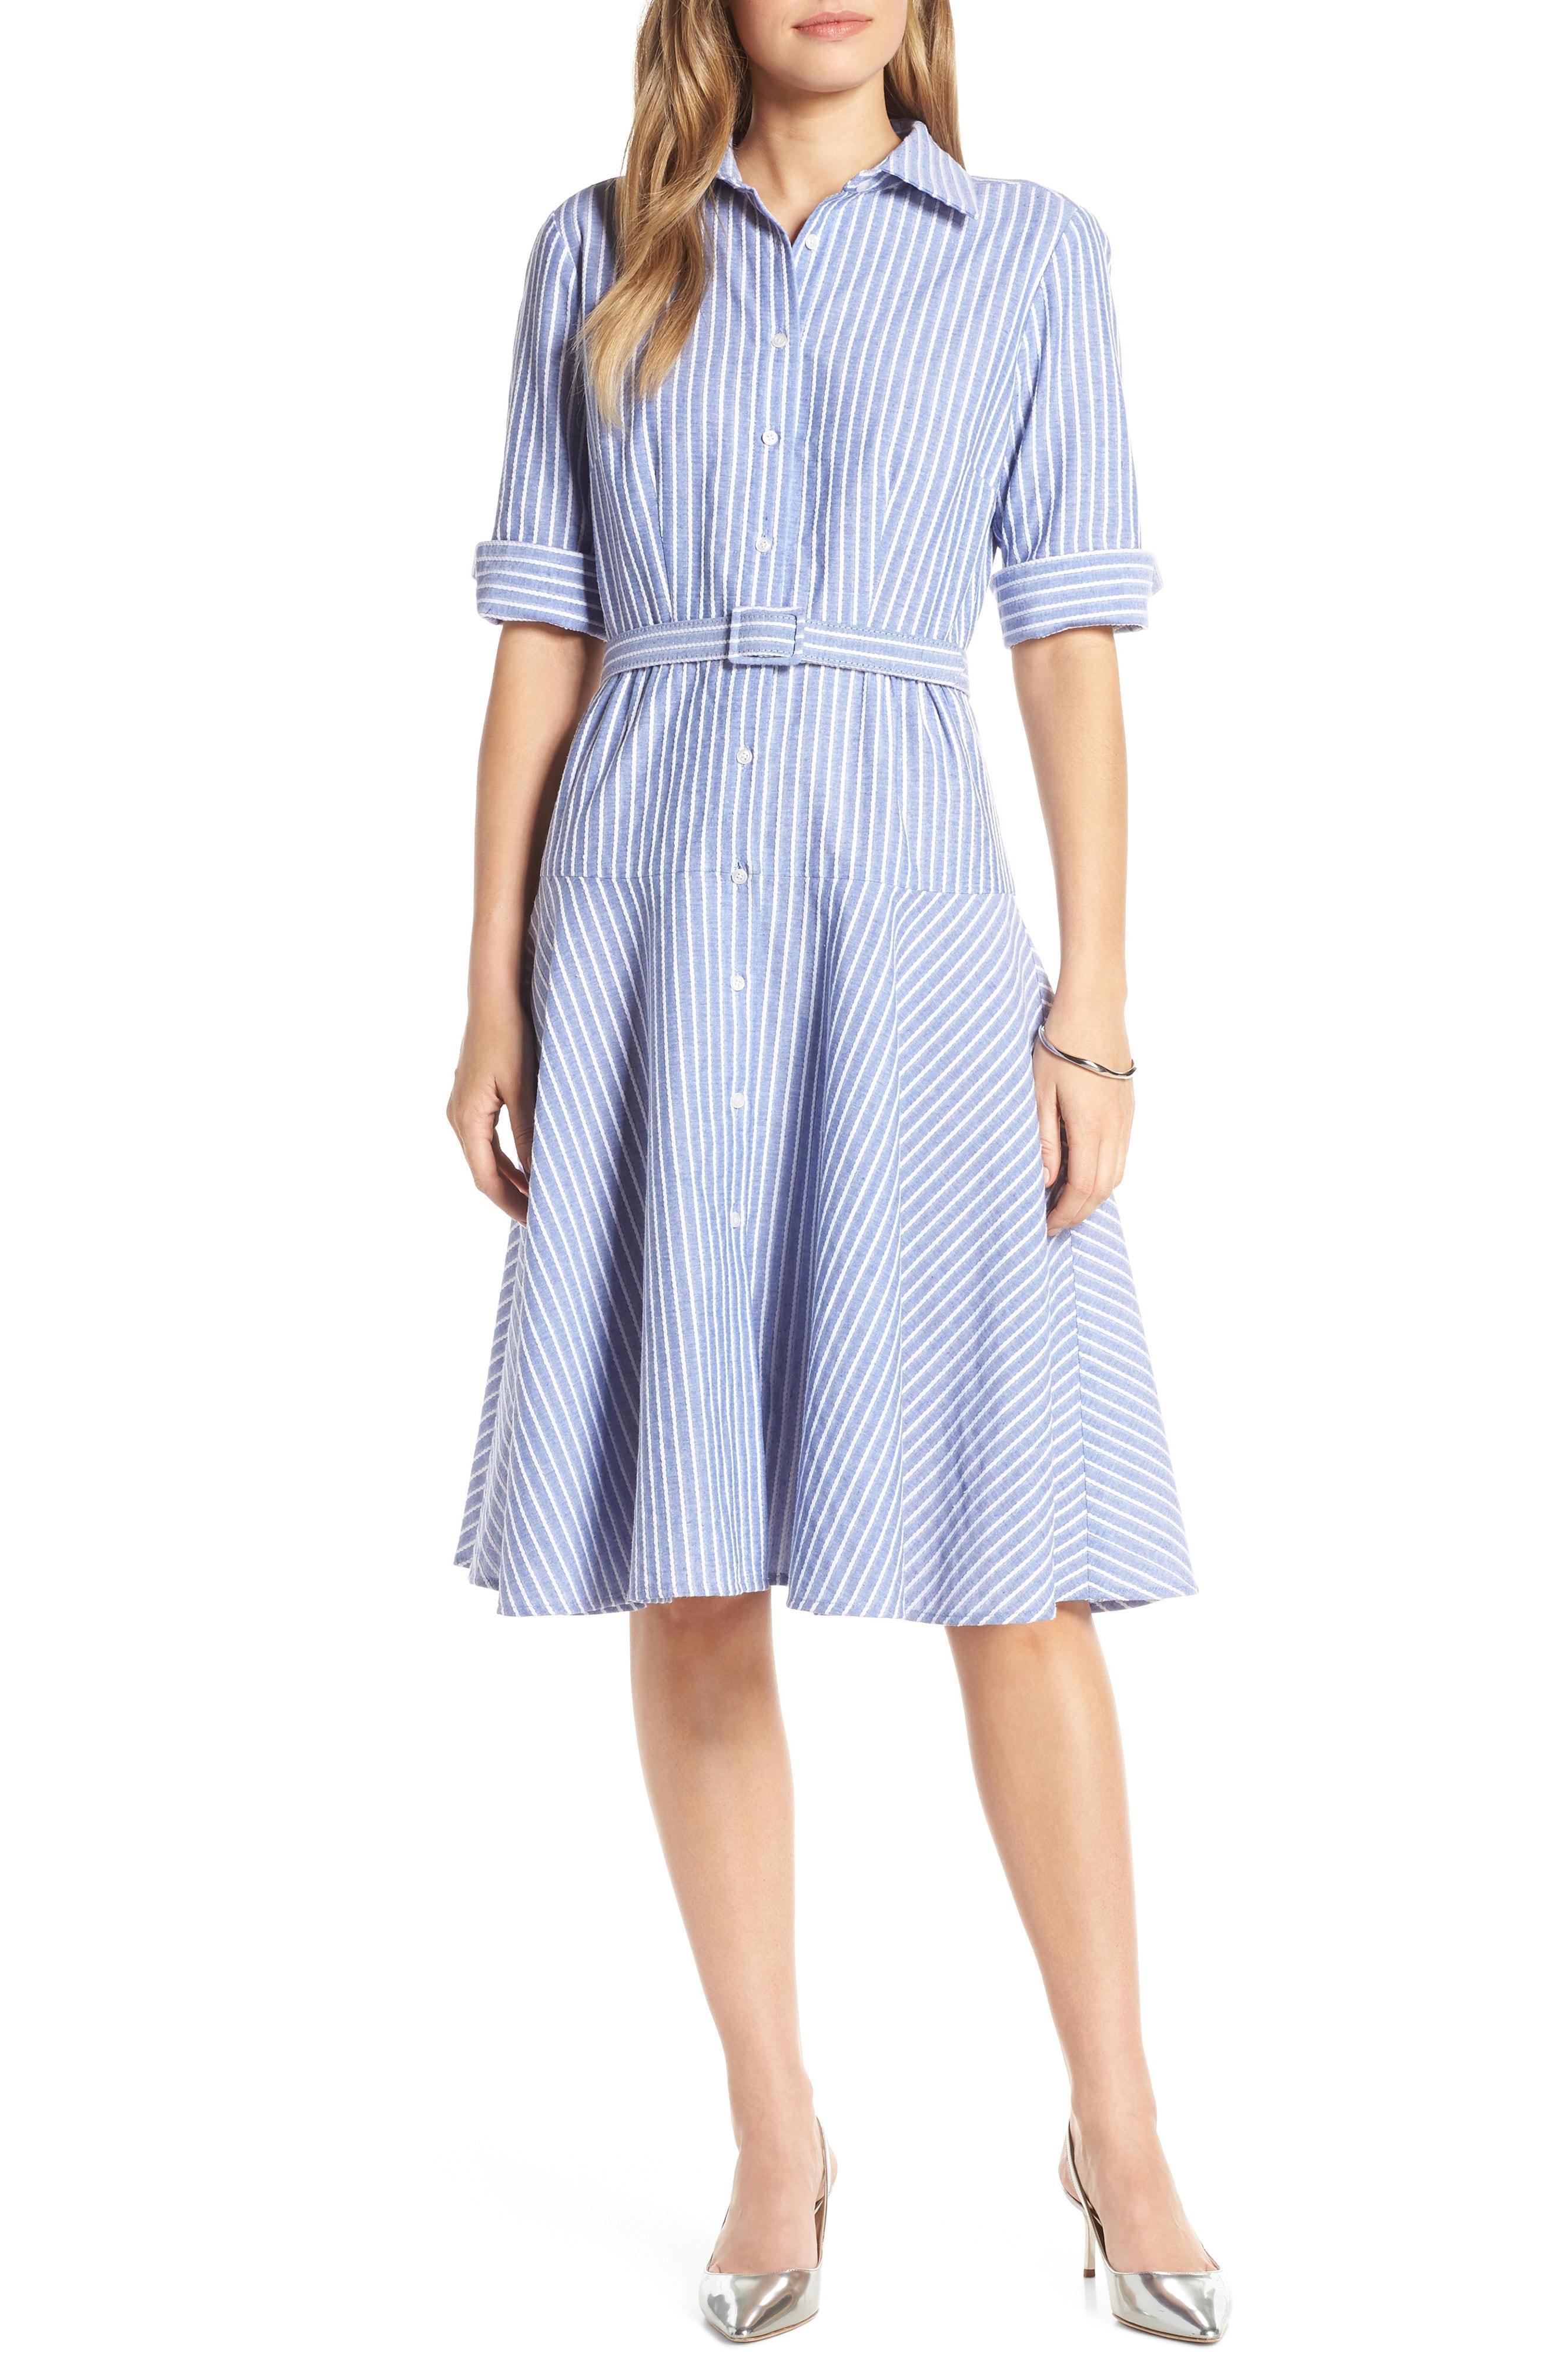 2da1df59eca Lyst - Nordstrom 1901 Stripe Belted Shirtdress in Blue